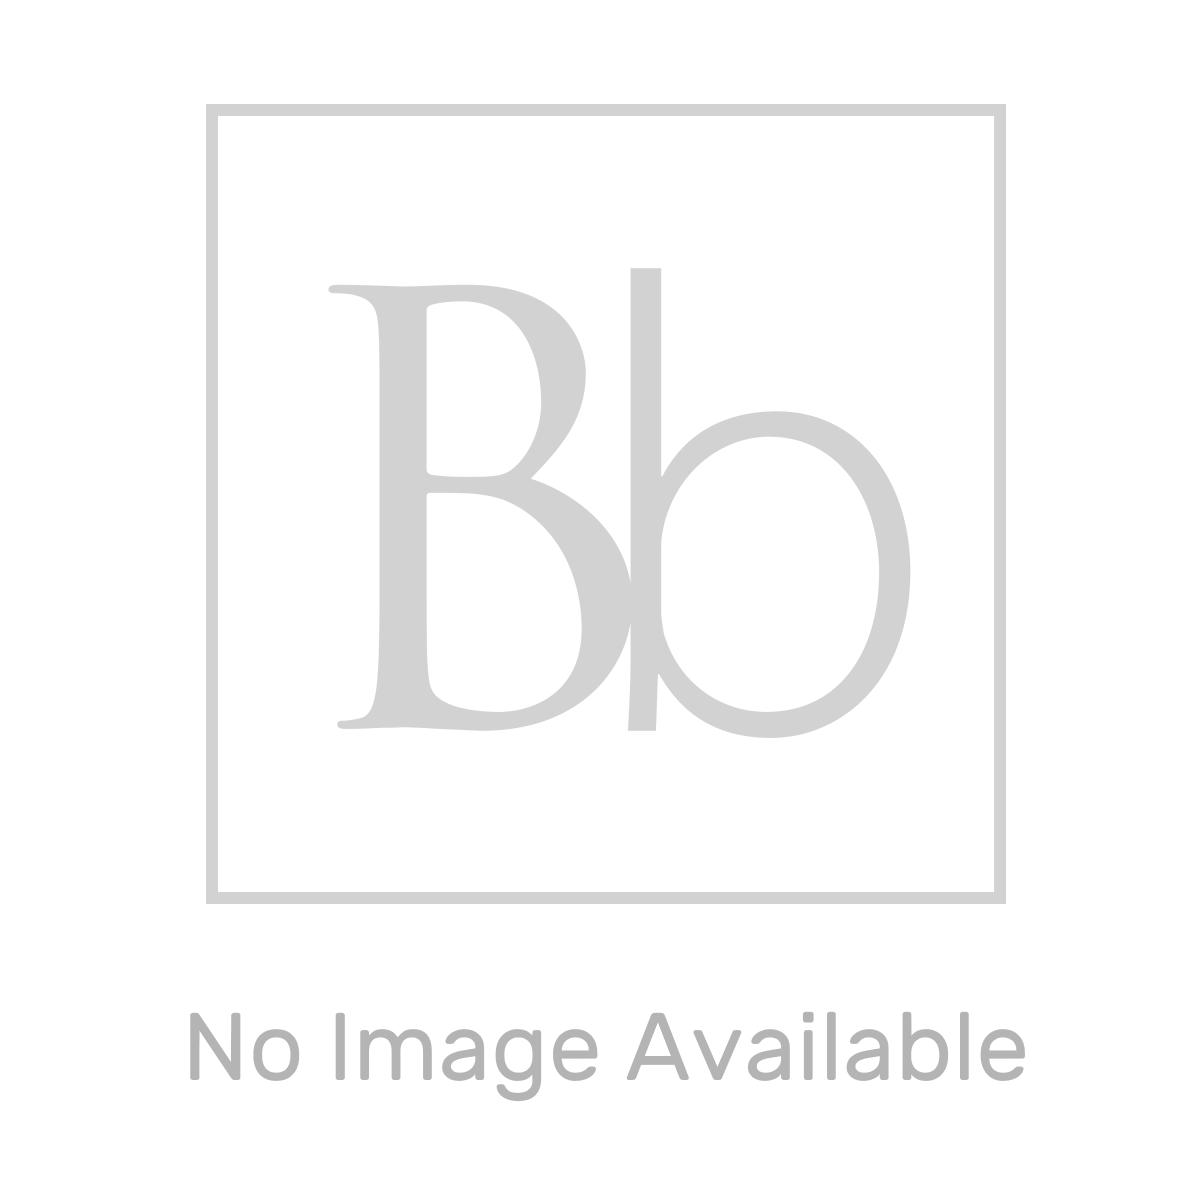 Cistermiser Standard Automatic Urinal Flush Control Valve